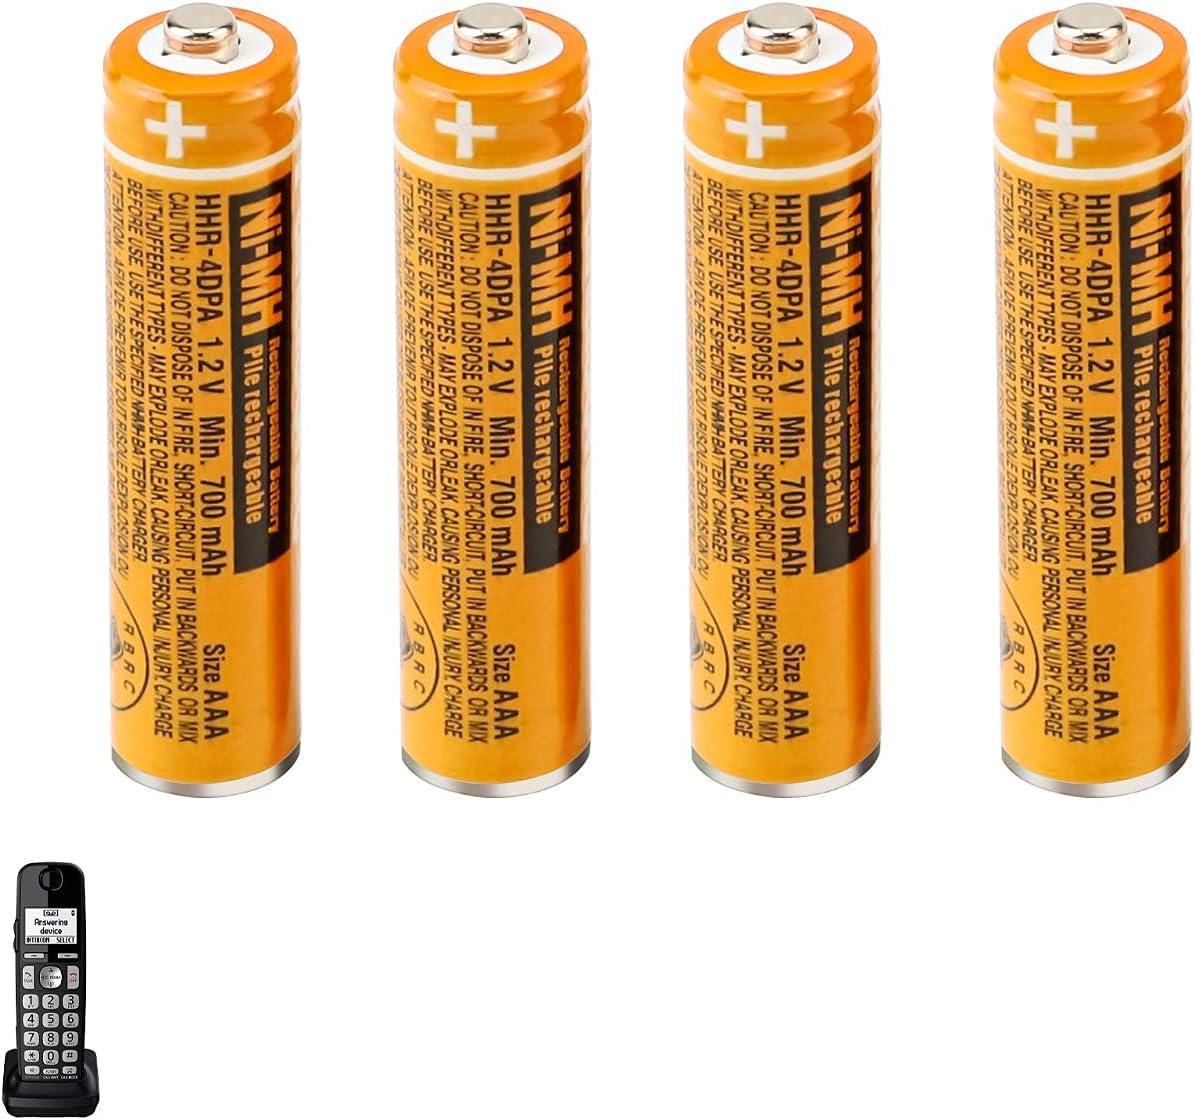 4PCS HHR-4DPA NI-MH AAA Rechargeable Batteries,1.2V 700mAh Battery for Panasonic Cordless Phone.